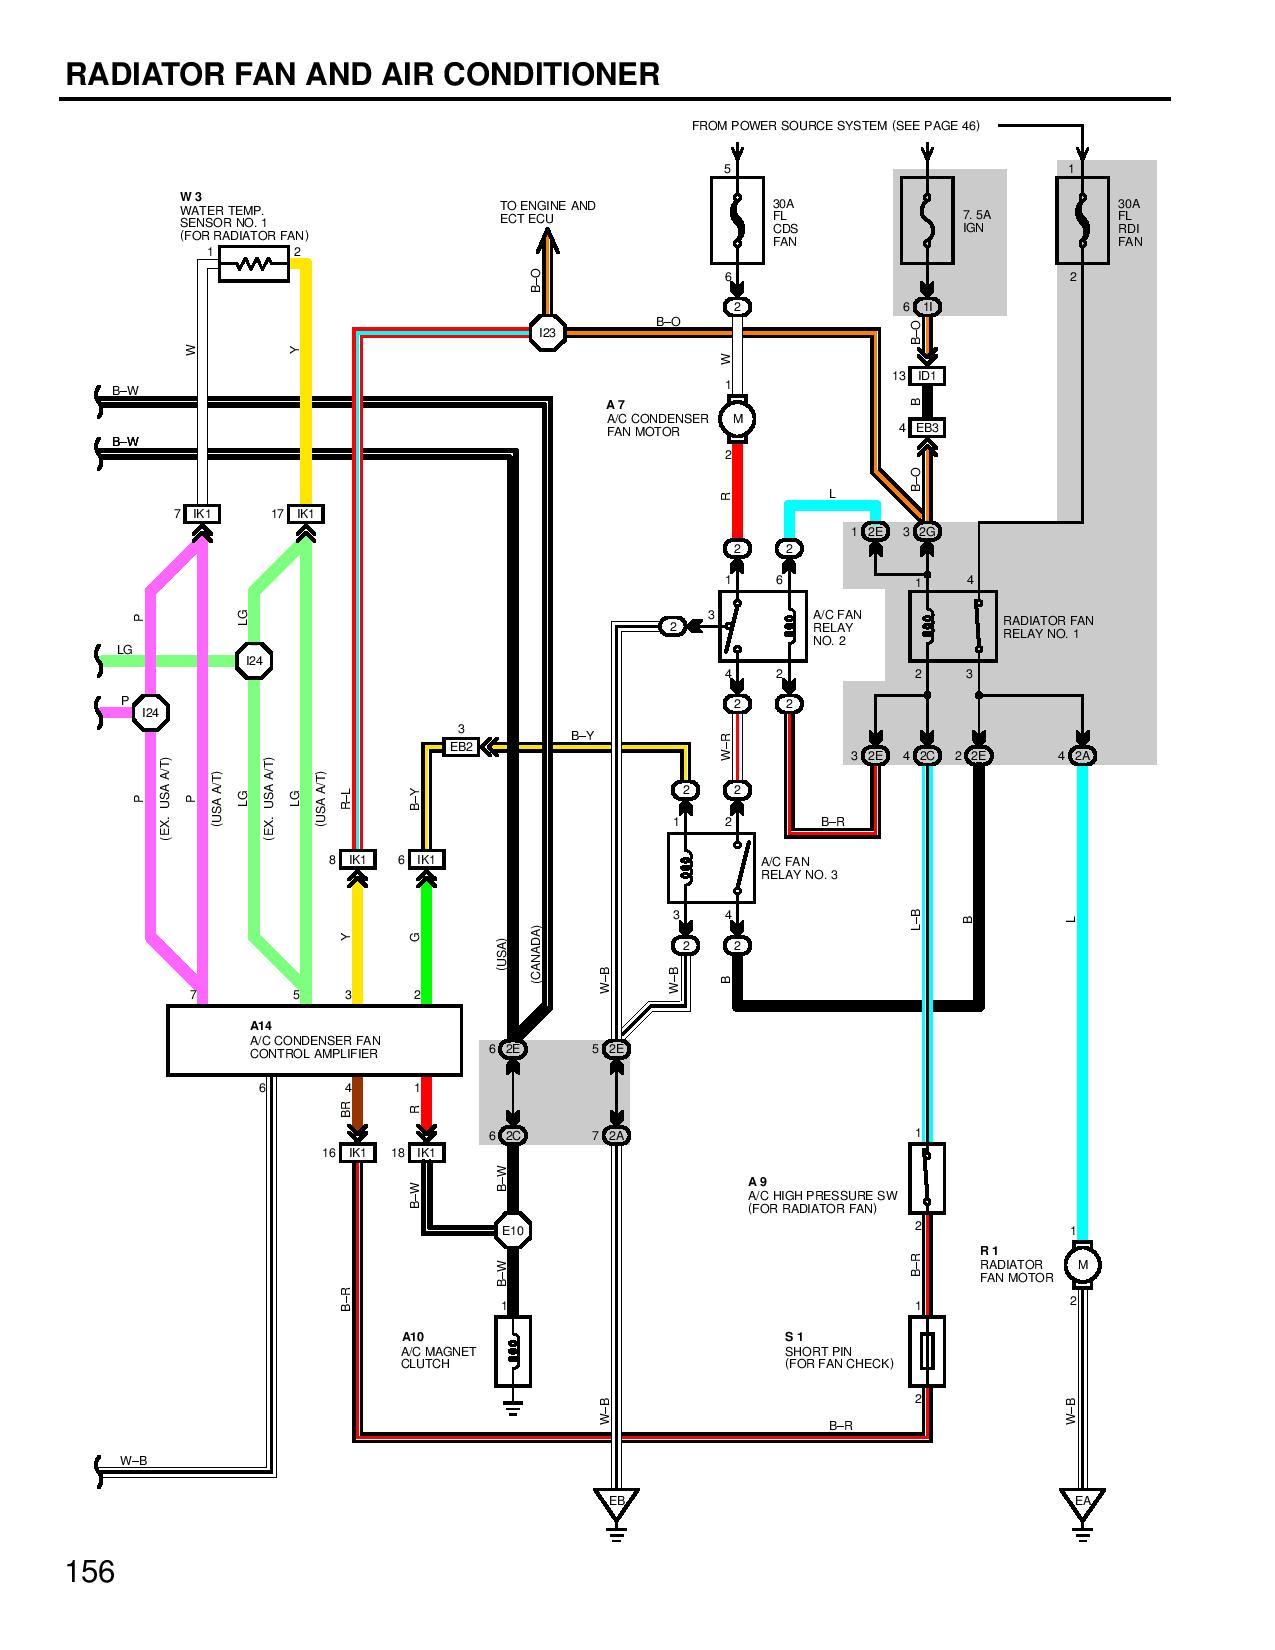 wiring diagram for daihatsu rocky wiring diagram 1990 daihatsu rocky parts daihatsu rocky wiring diagram #6